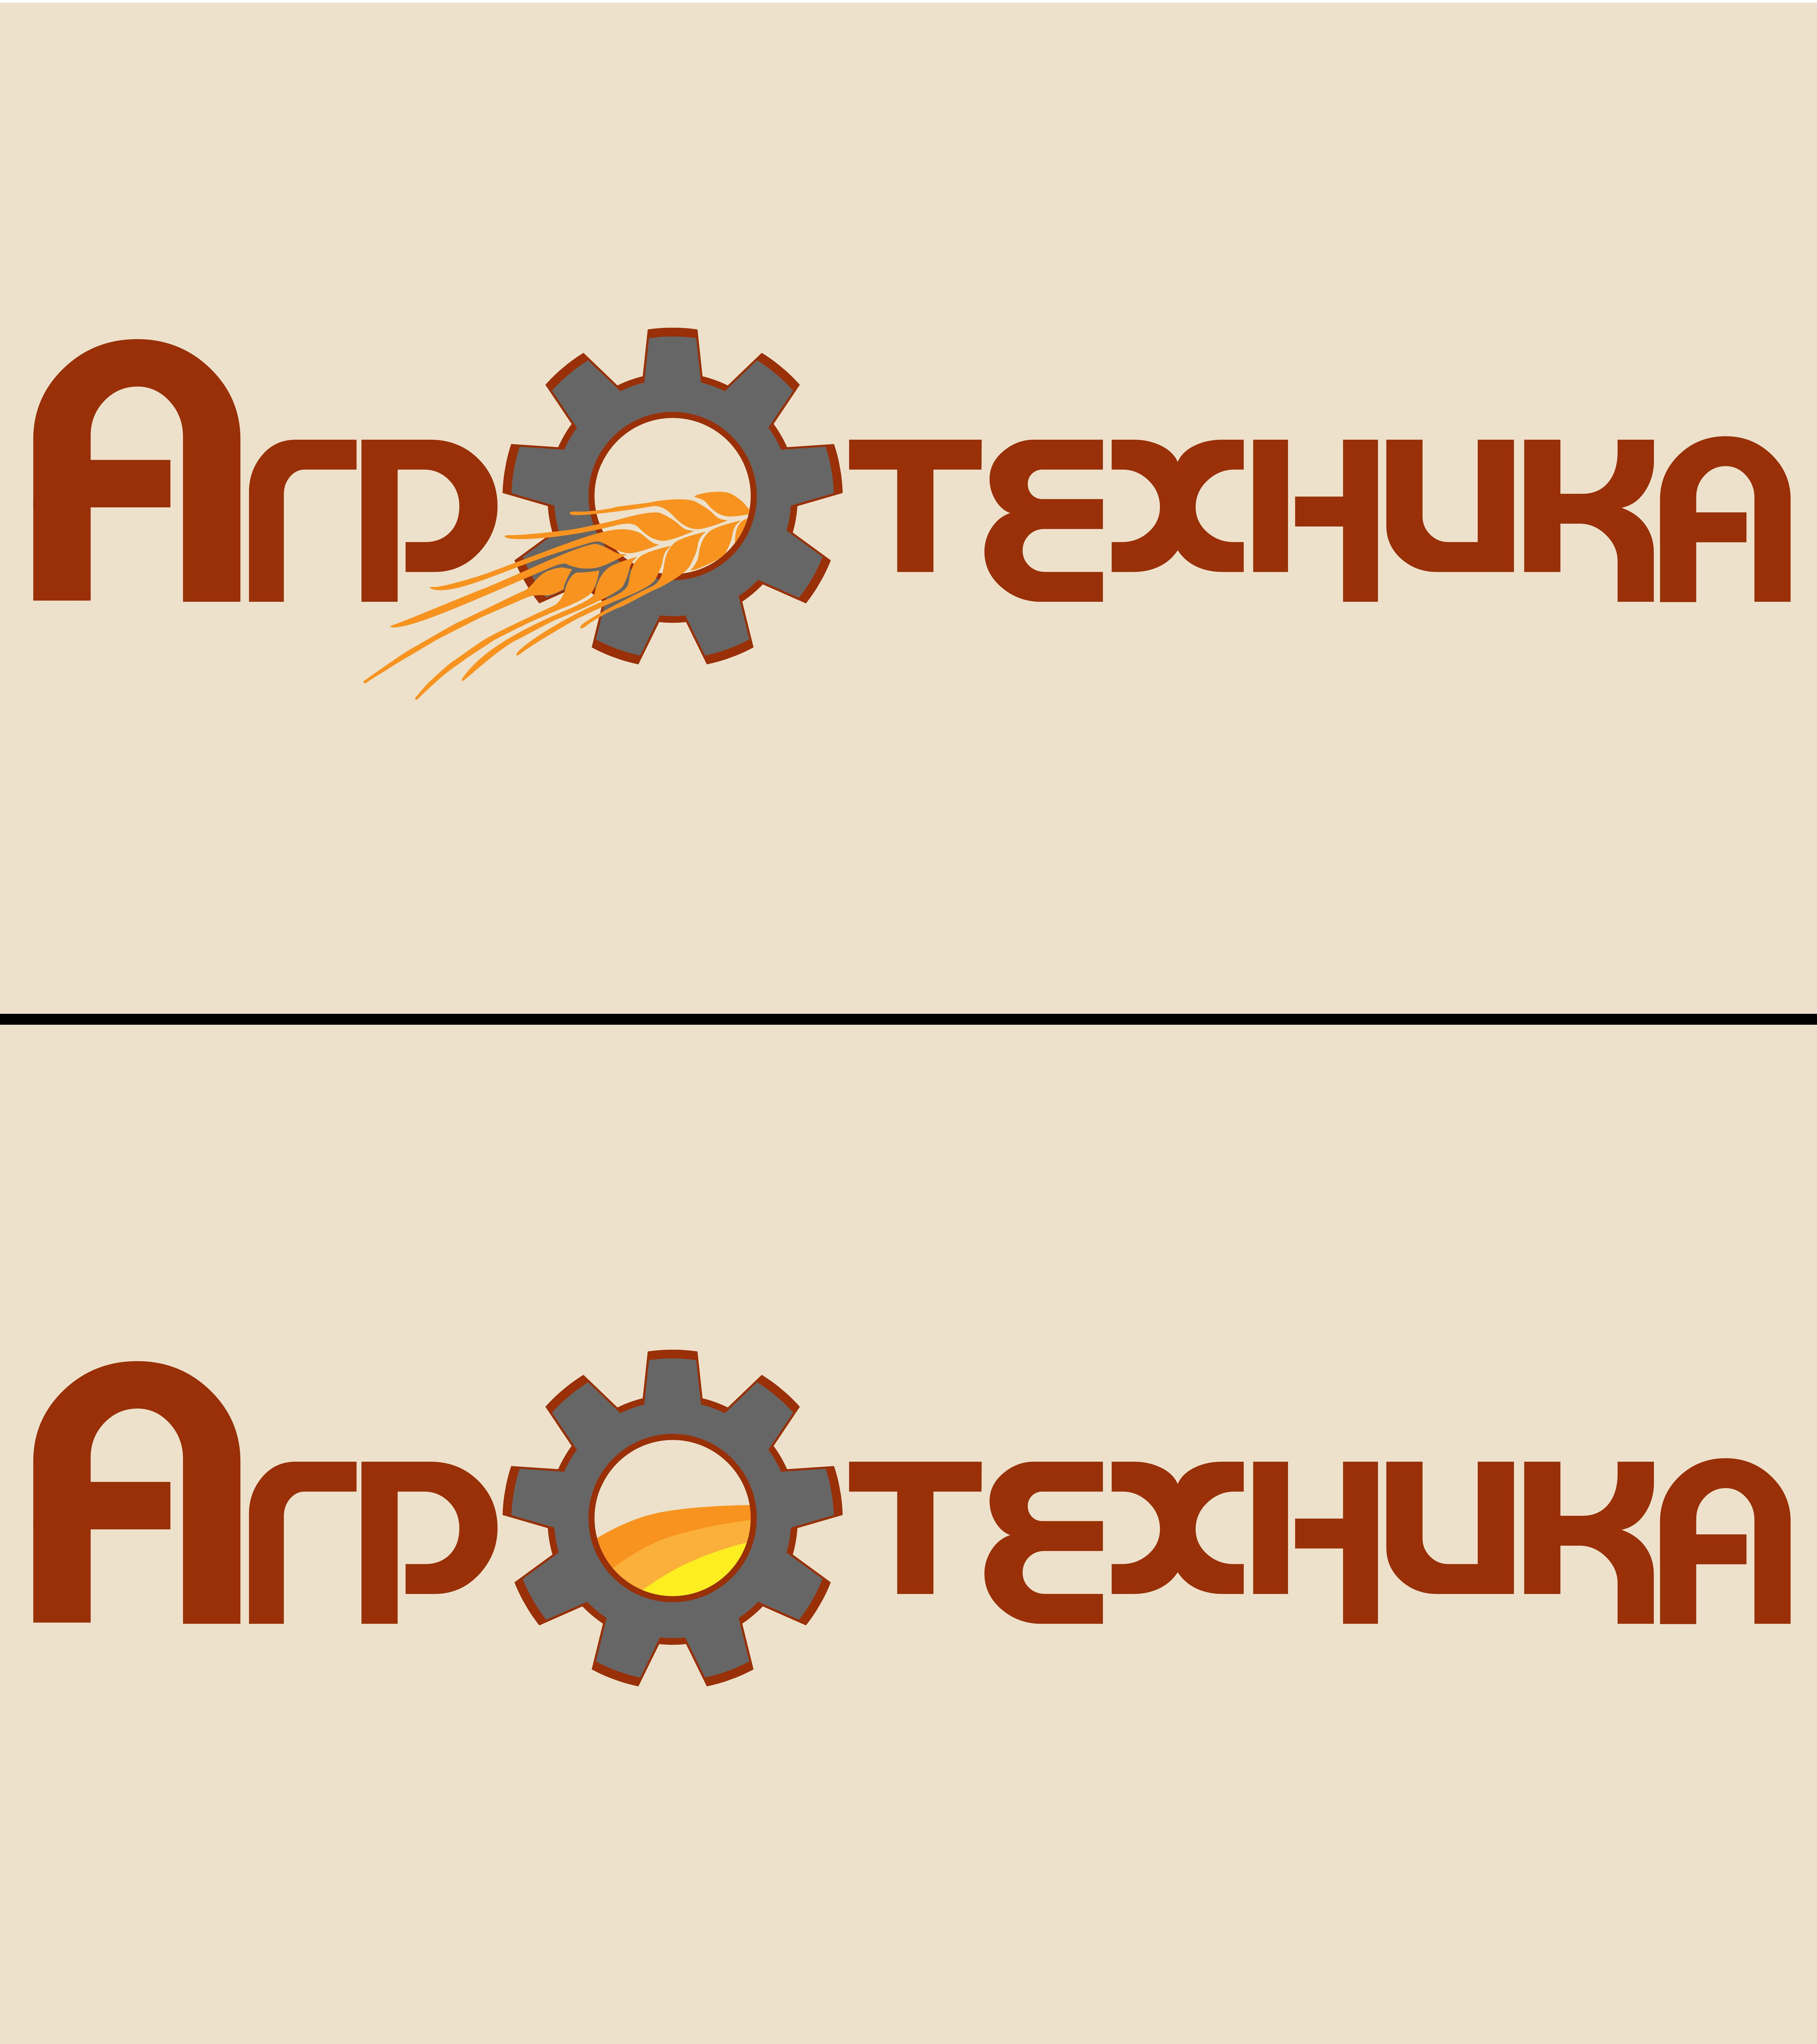 Разработка логотипа для компании Агротехника фото f_3445c02e192d623c.jpg